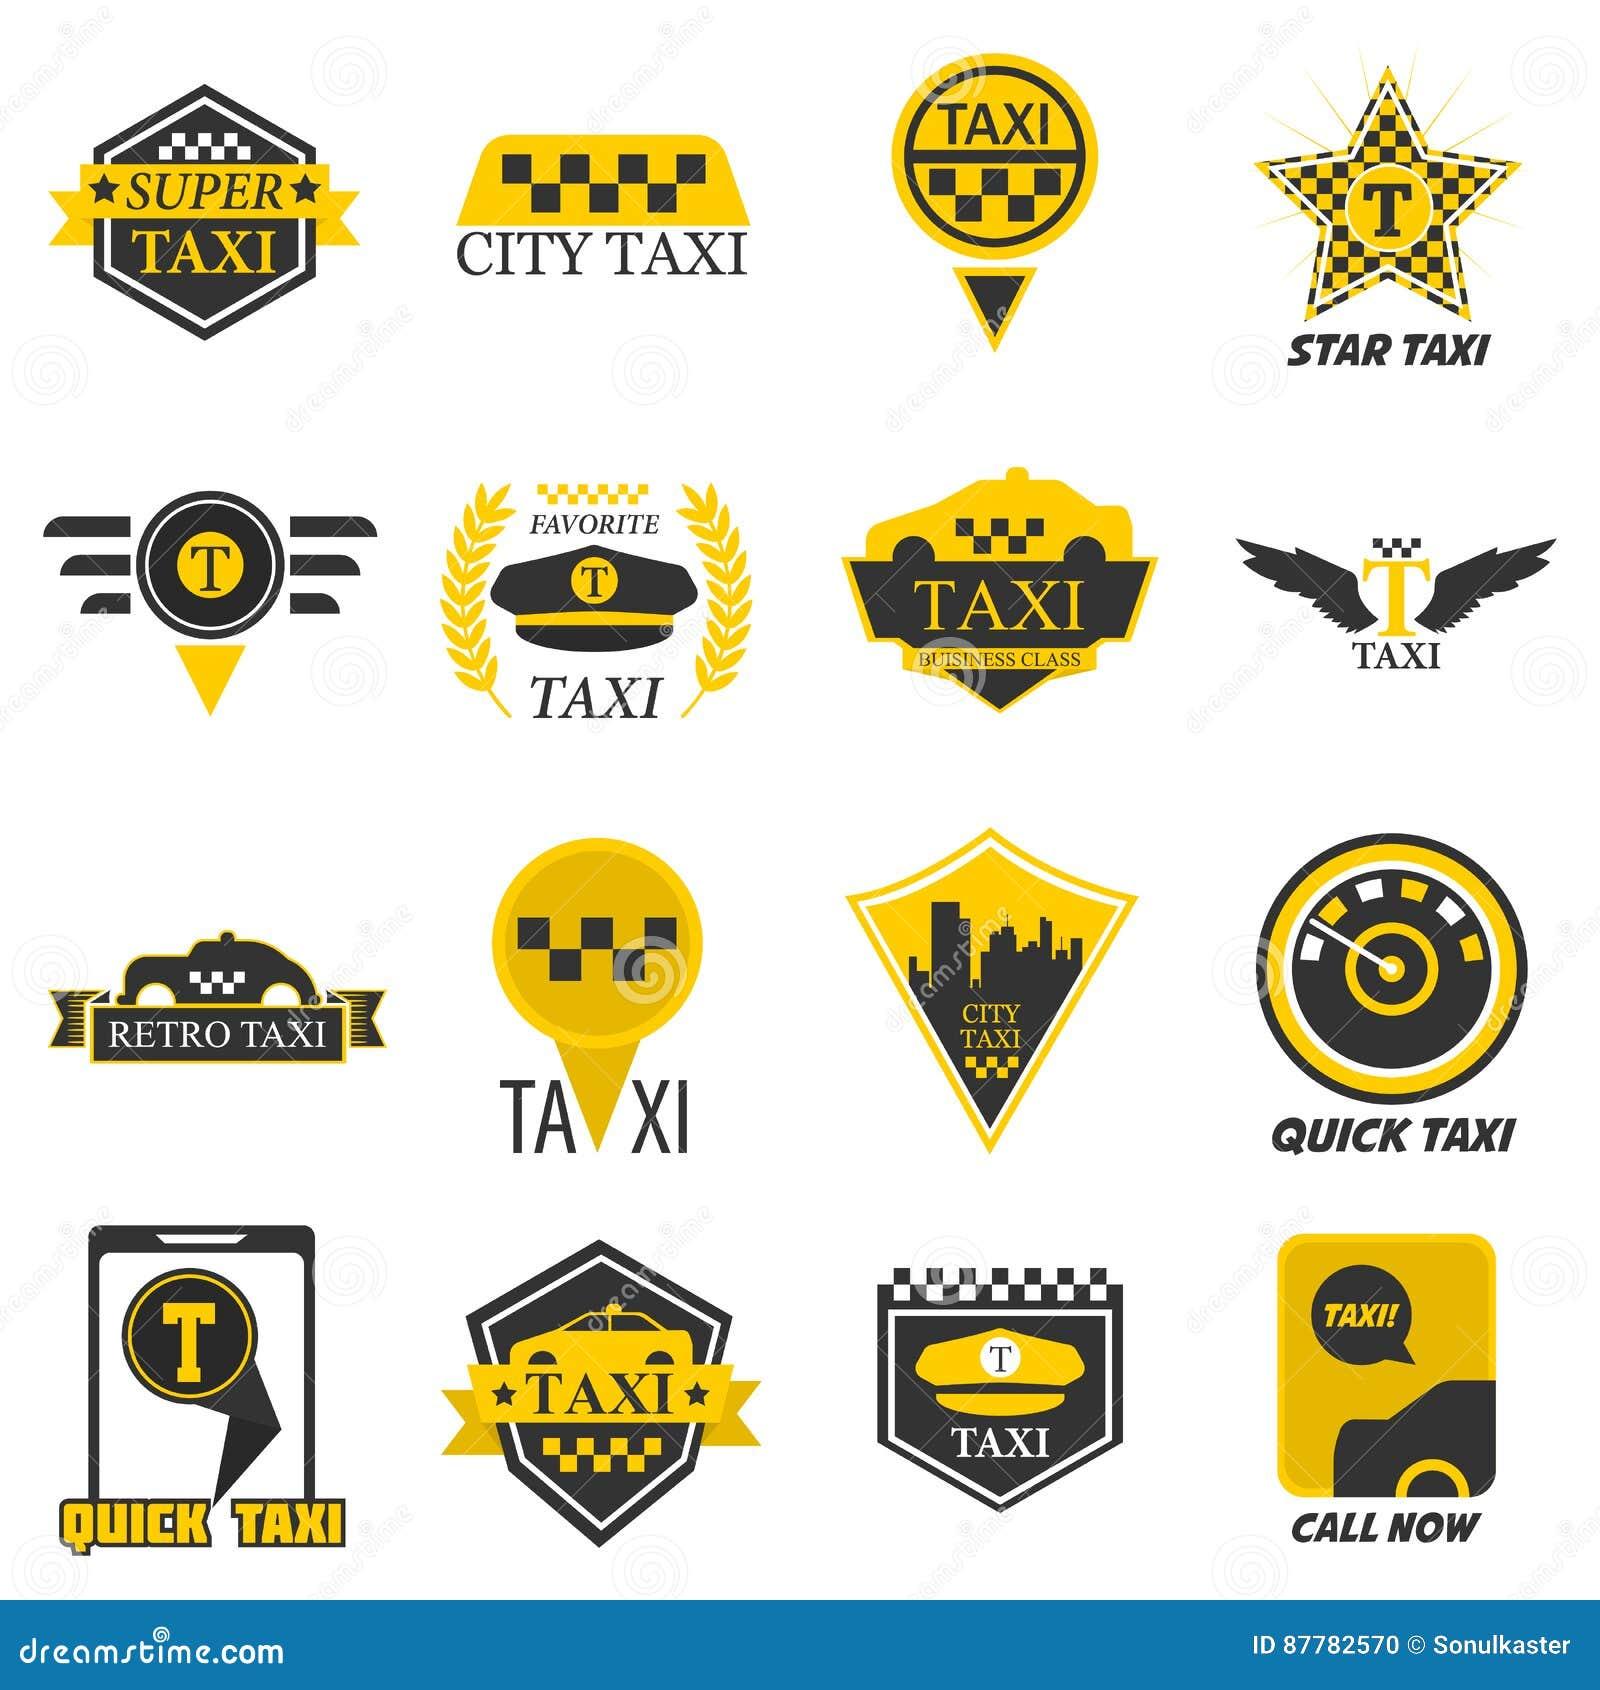 82372dfe15e Taxi logo templates for company web or smartphone application icon. Yellow  checkered symbol